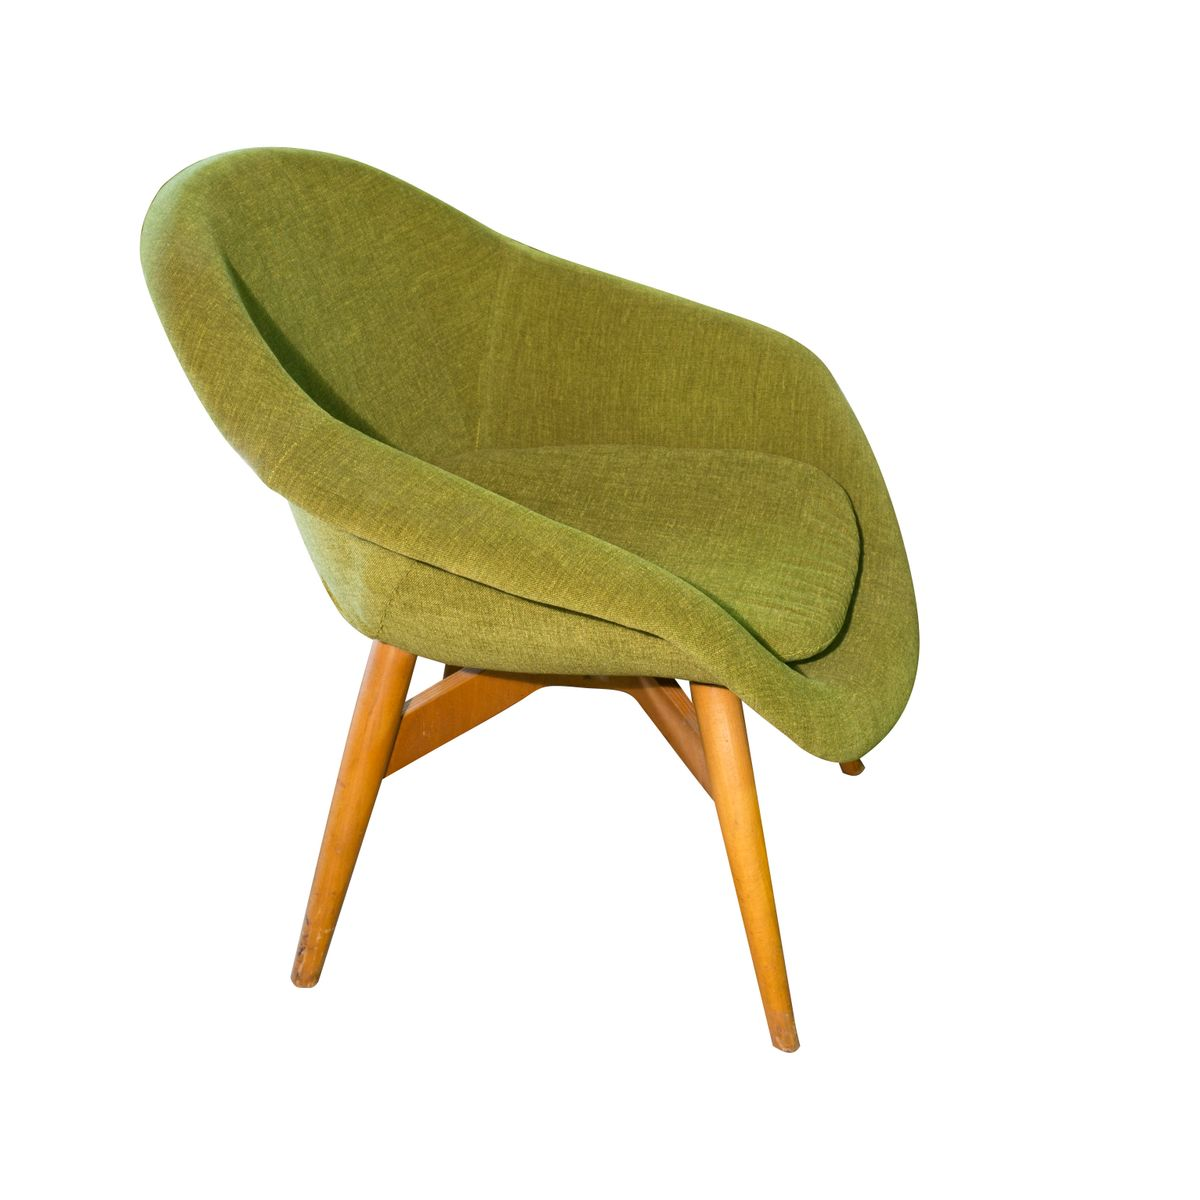 Mid Century Easy Chairs By Frantisek Jirak For Tatra Set